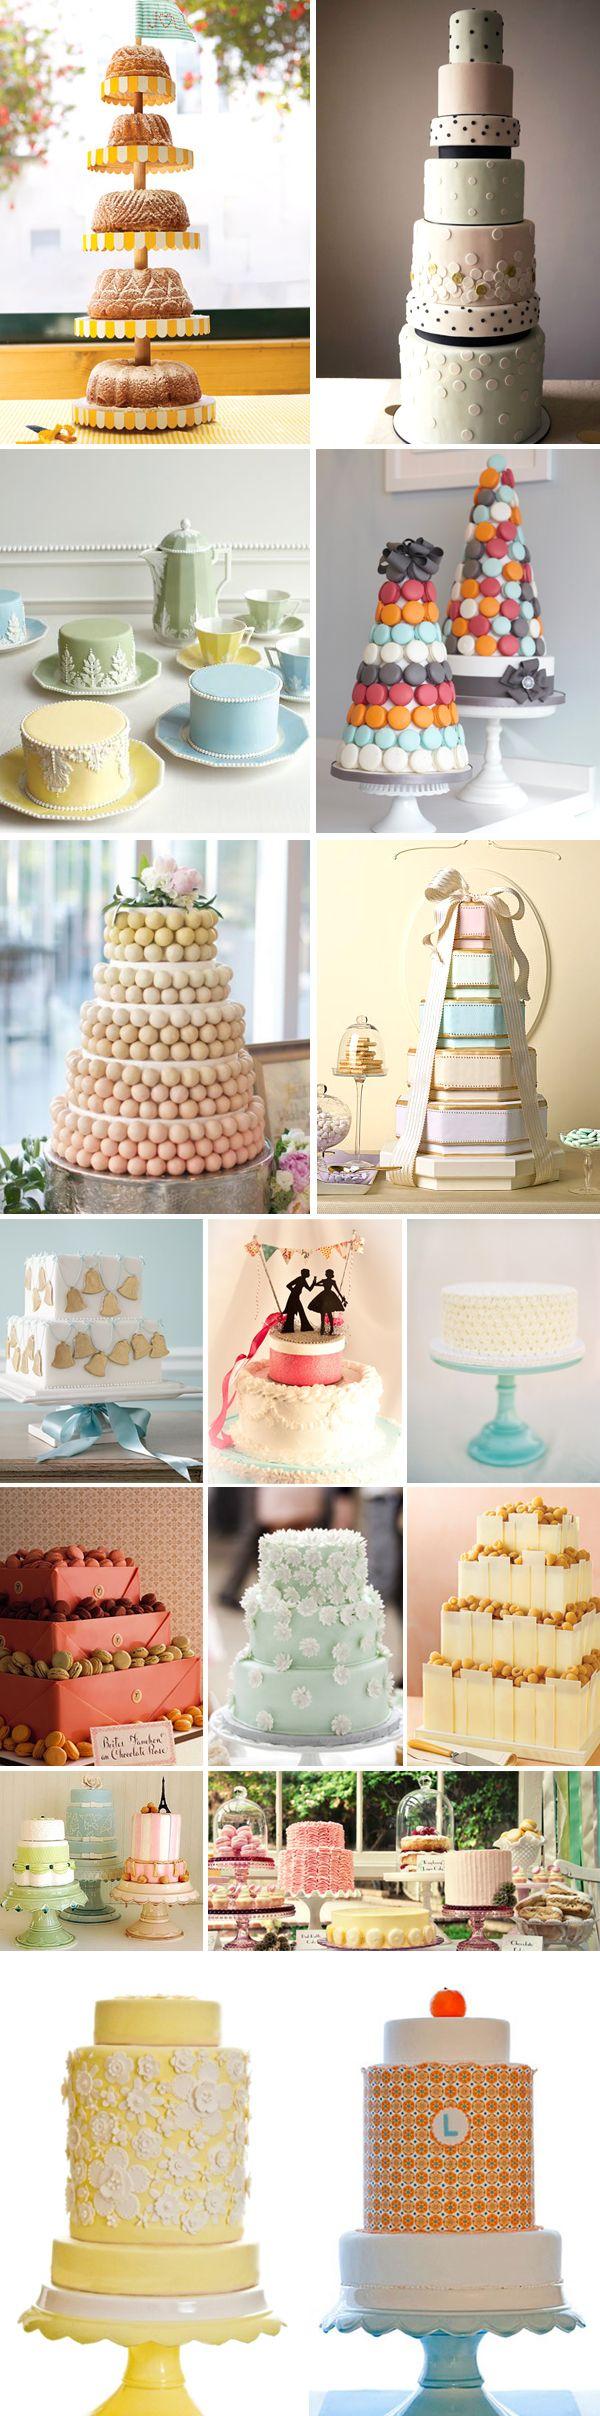 beautiful wedding cake designs wedding cake designs wedding